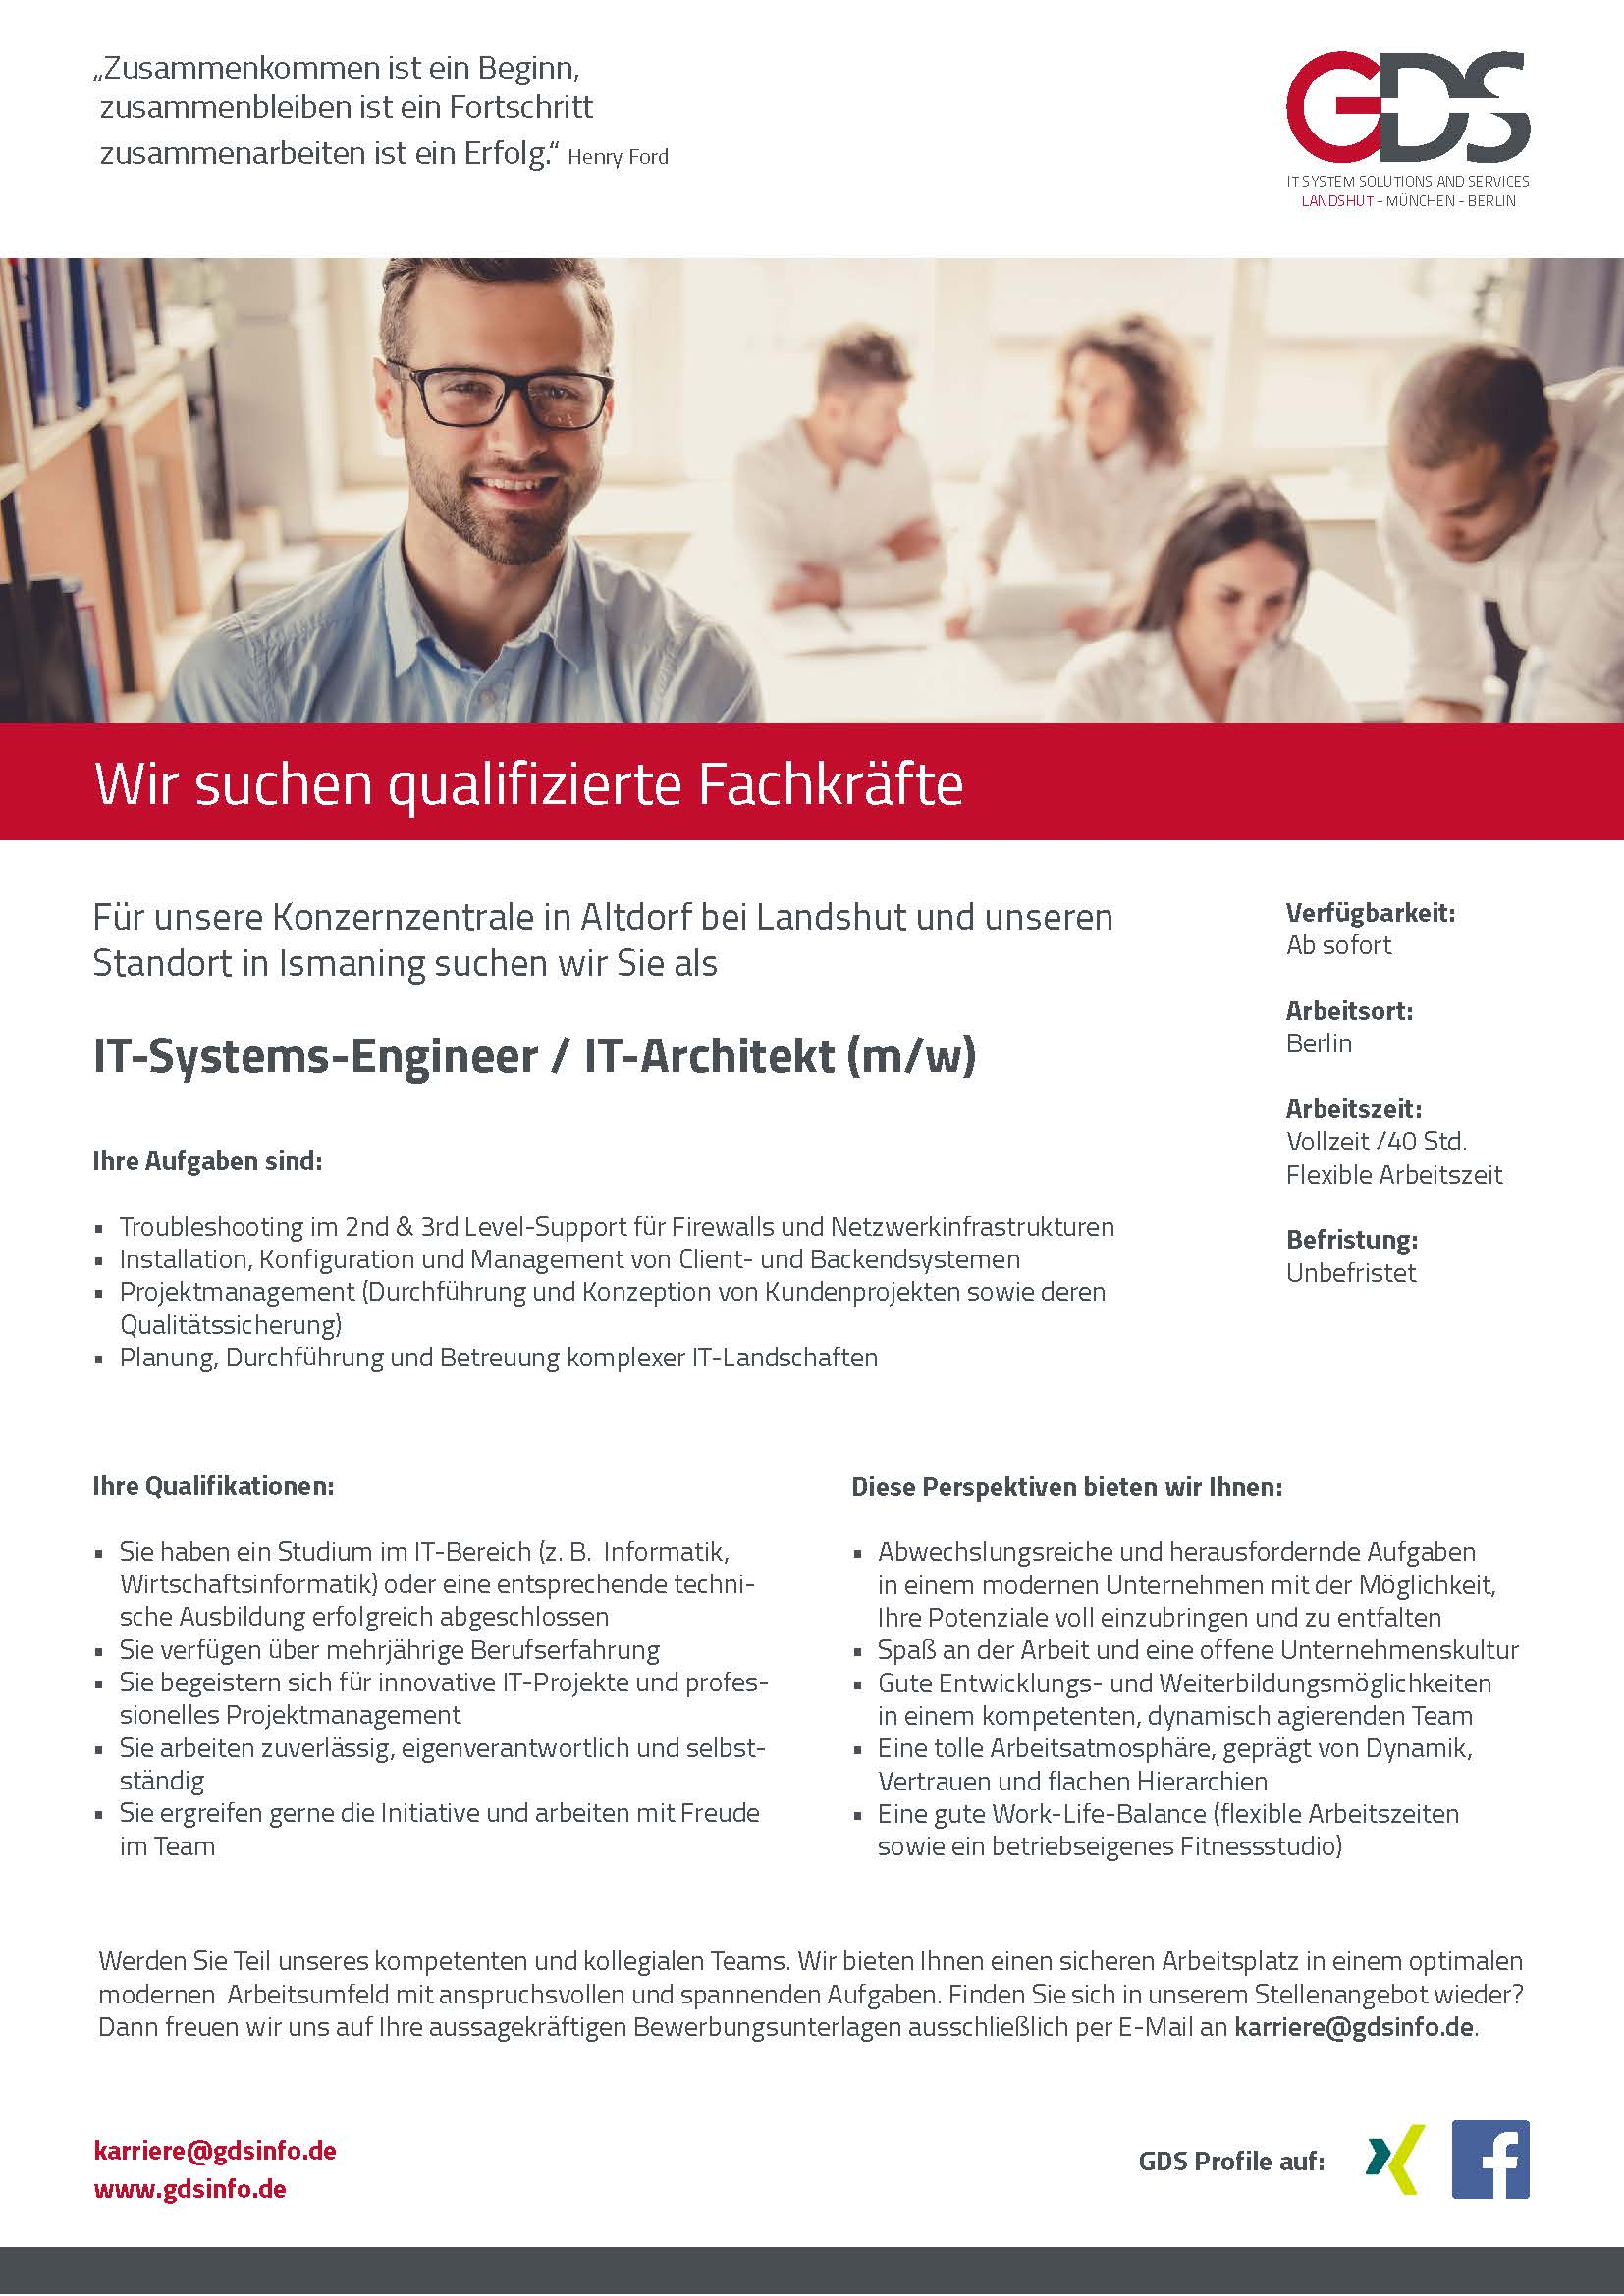 IT-Systems-Engineer / IT-Architekt (m/w)